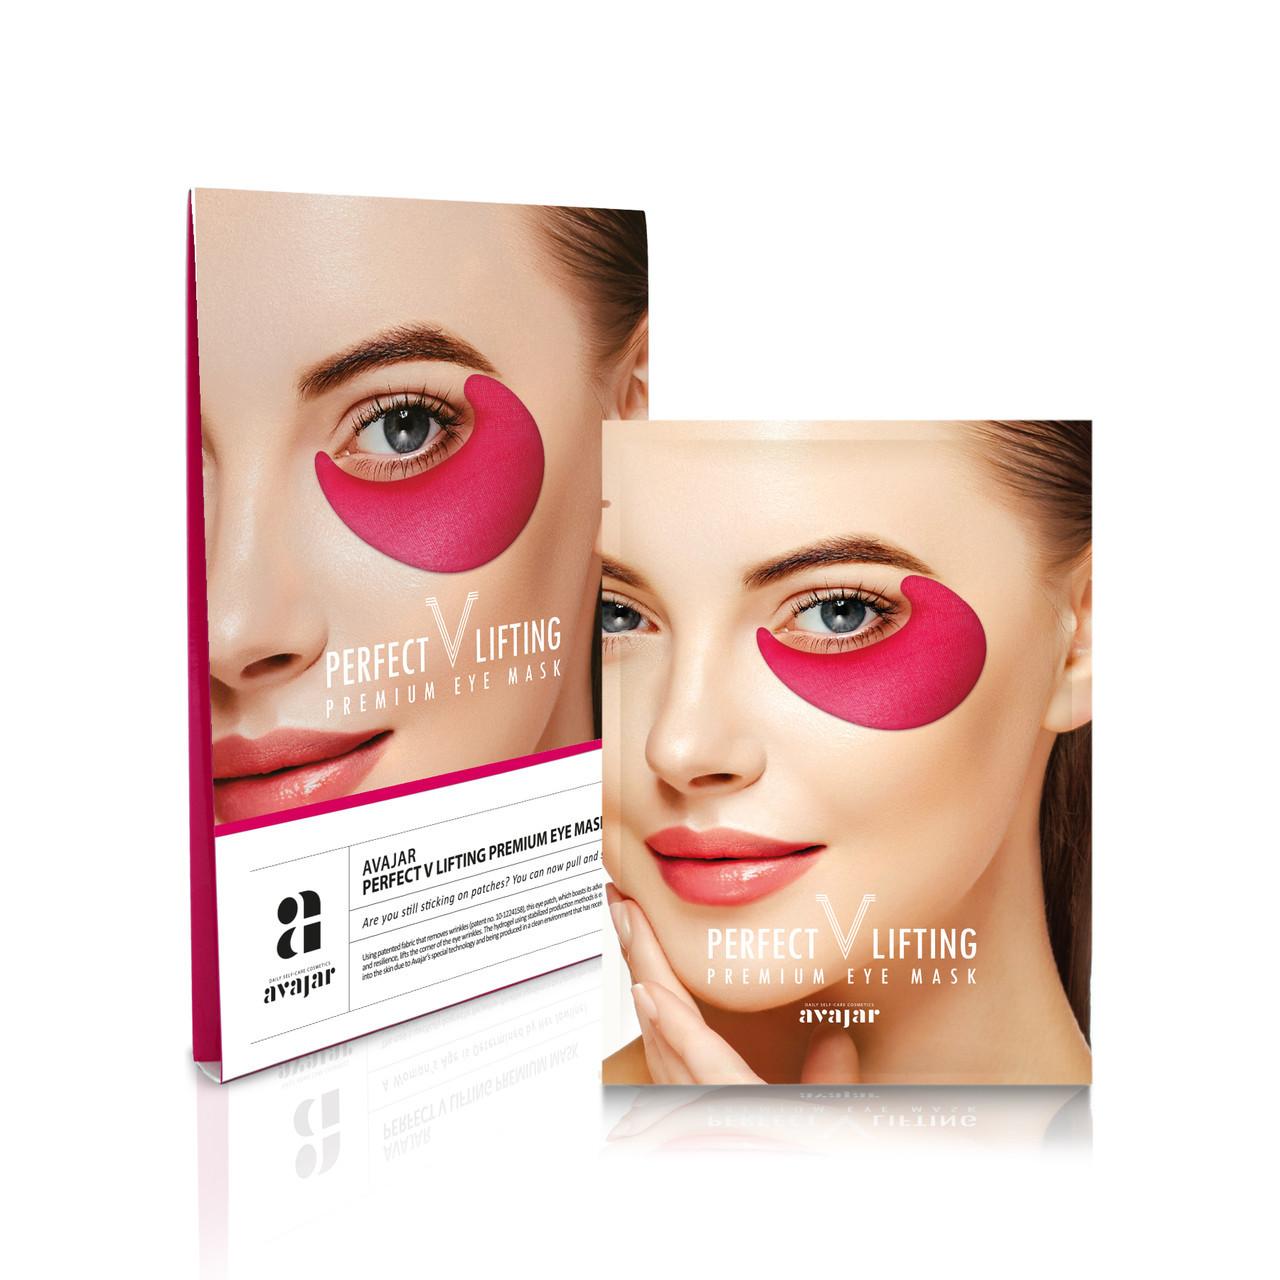 Лифтинг патчи Avajar Perfect V lifting Premium Eye Mask 2 пара